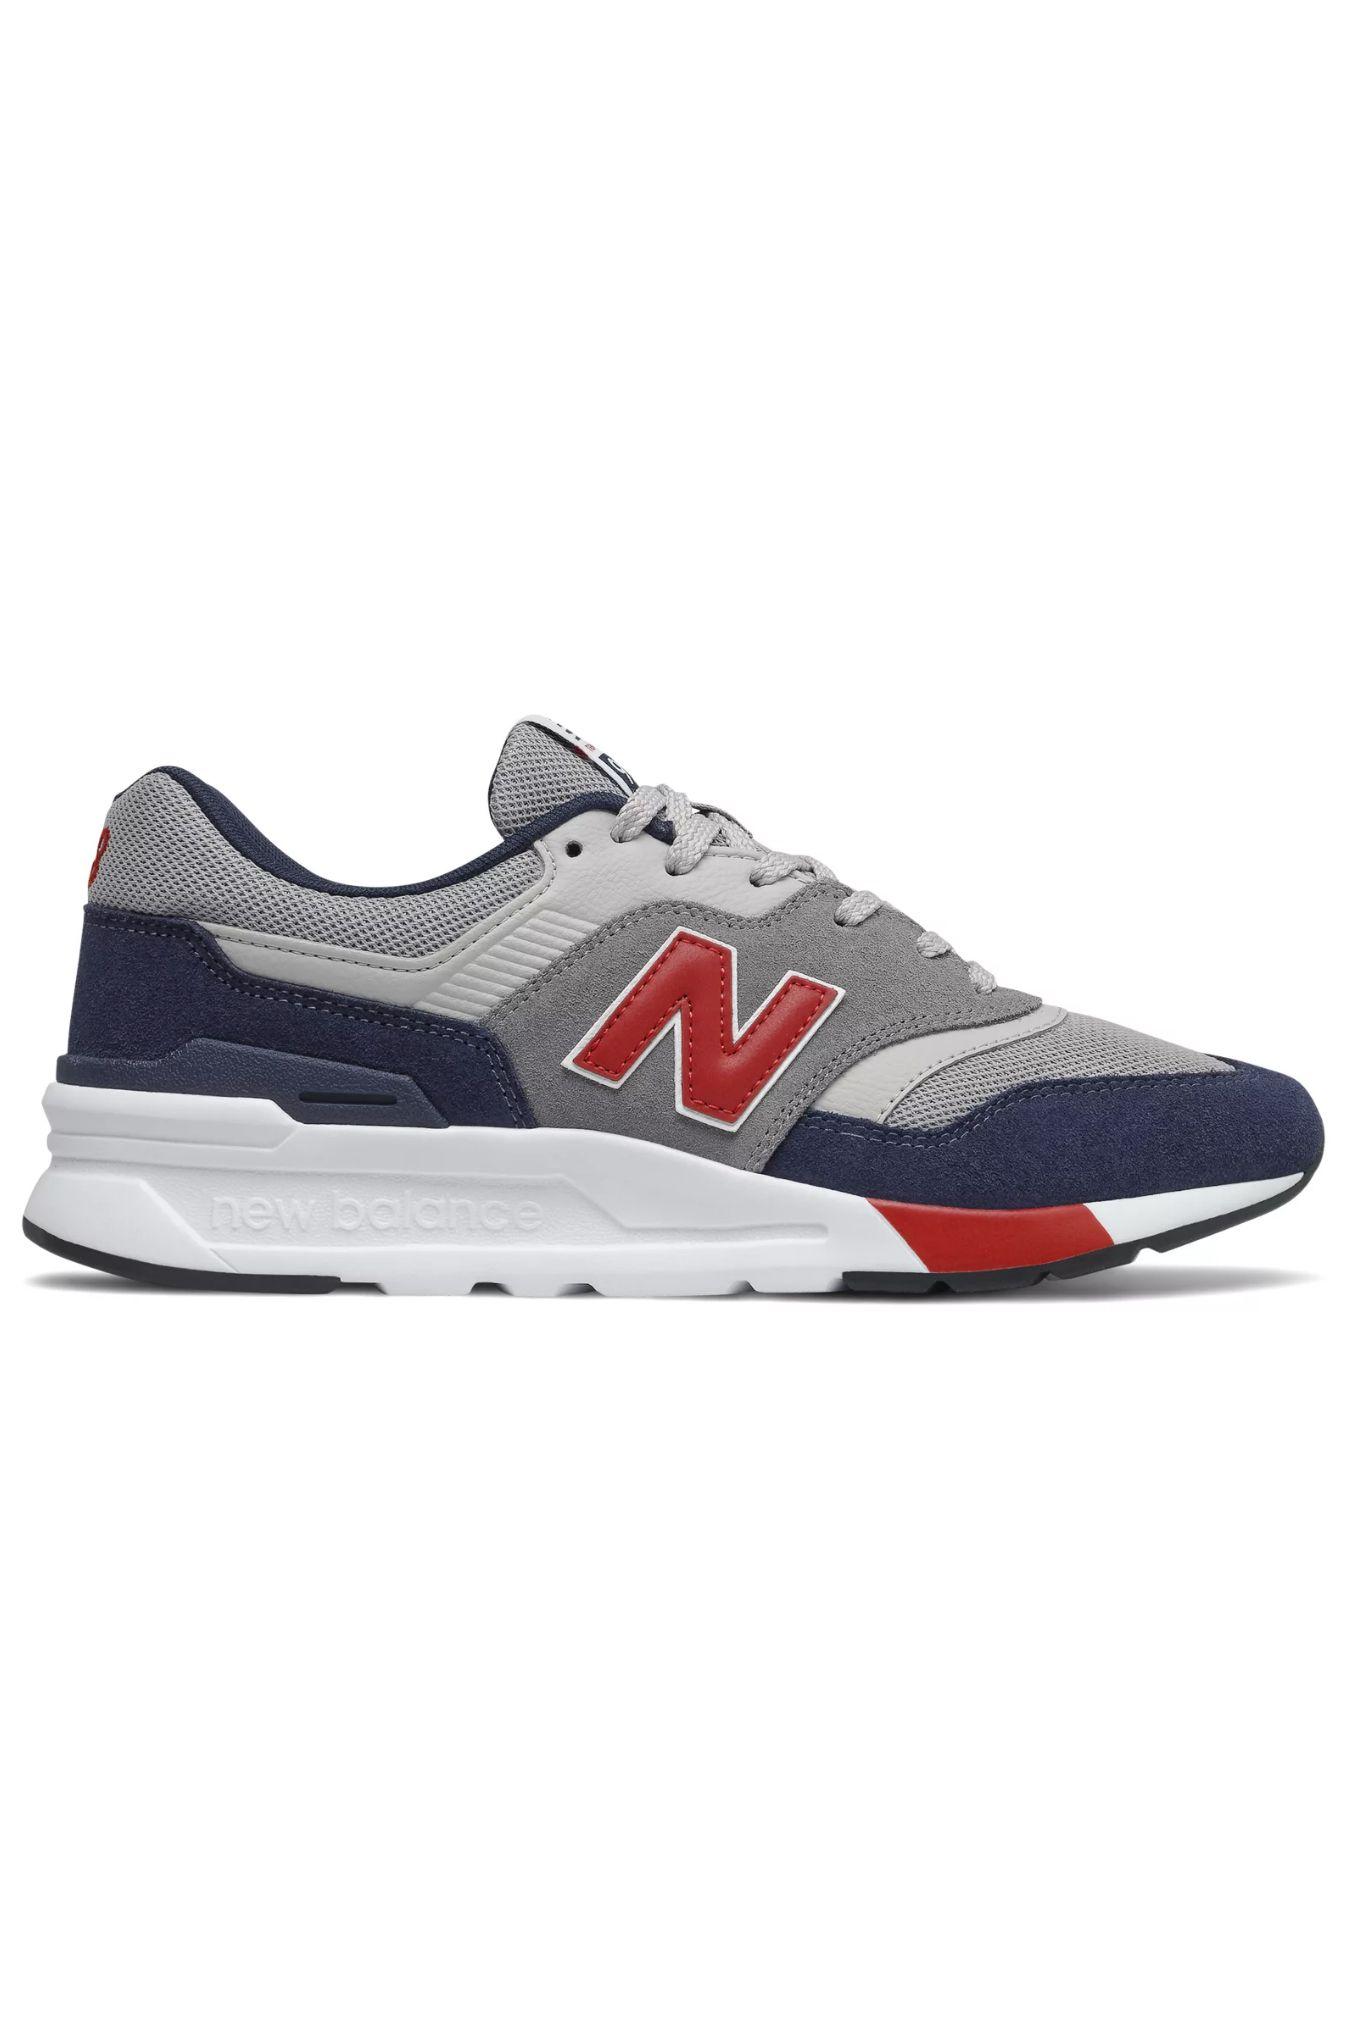 Tenis New Balance CM997 Red/Navy